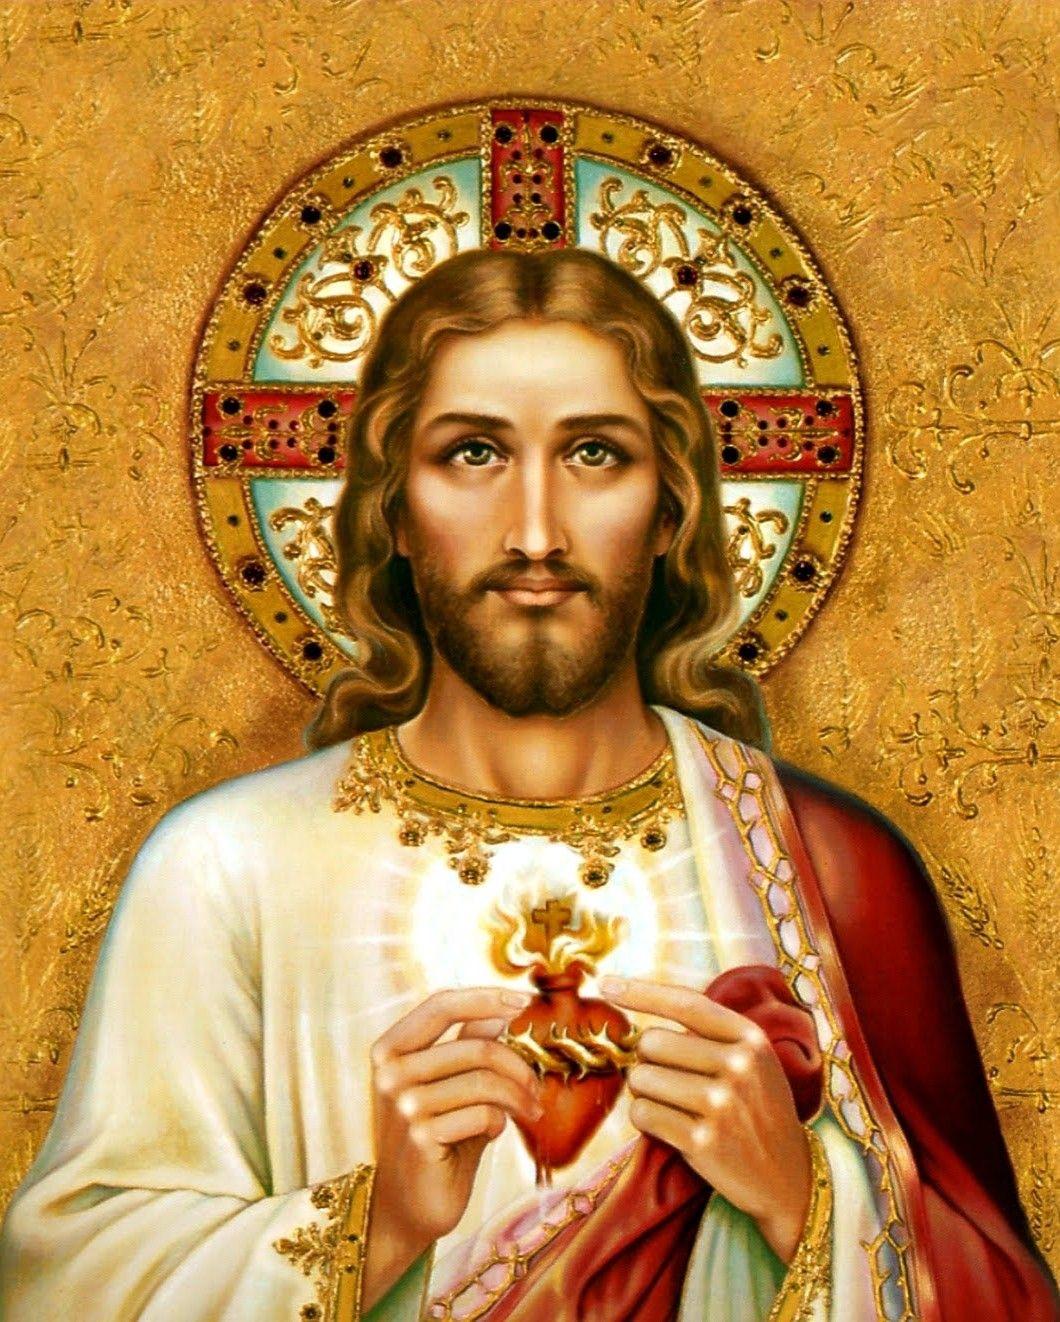 Sacred Heart Of Jesus Jesus Christ Wall Art Decor Canvas Home Decor Jesus Picture Sacred Heart Art Catholic Artwork Catholic Art